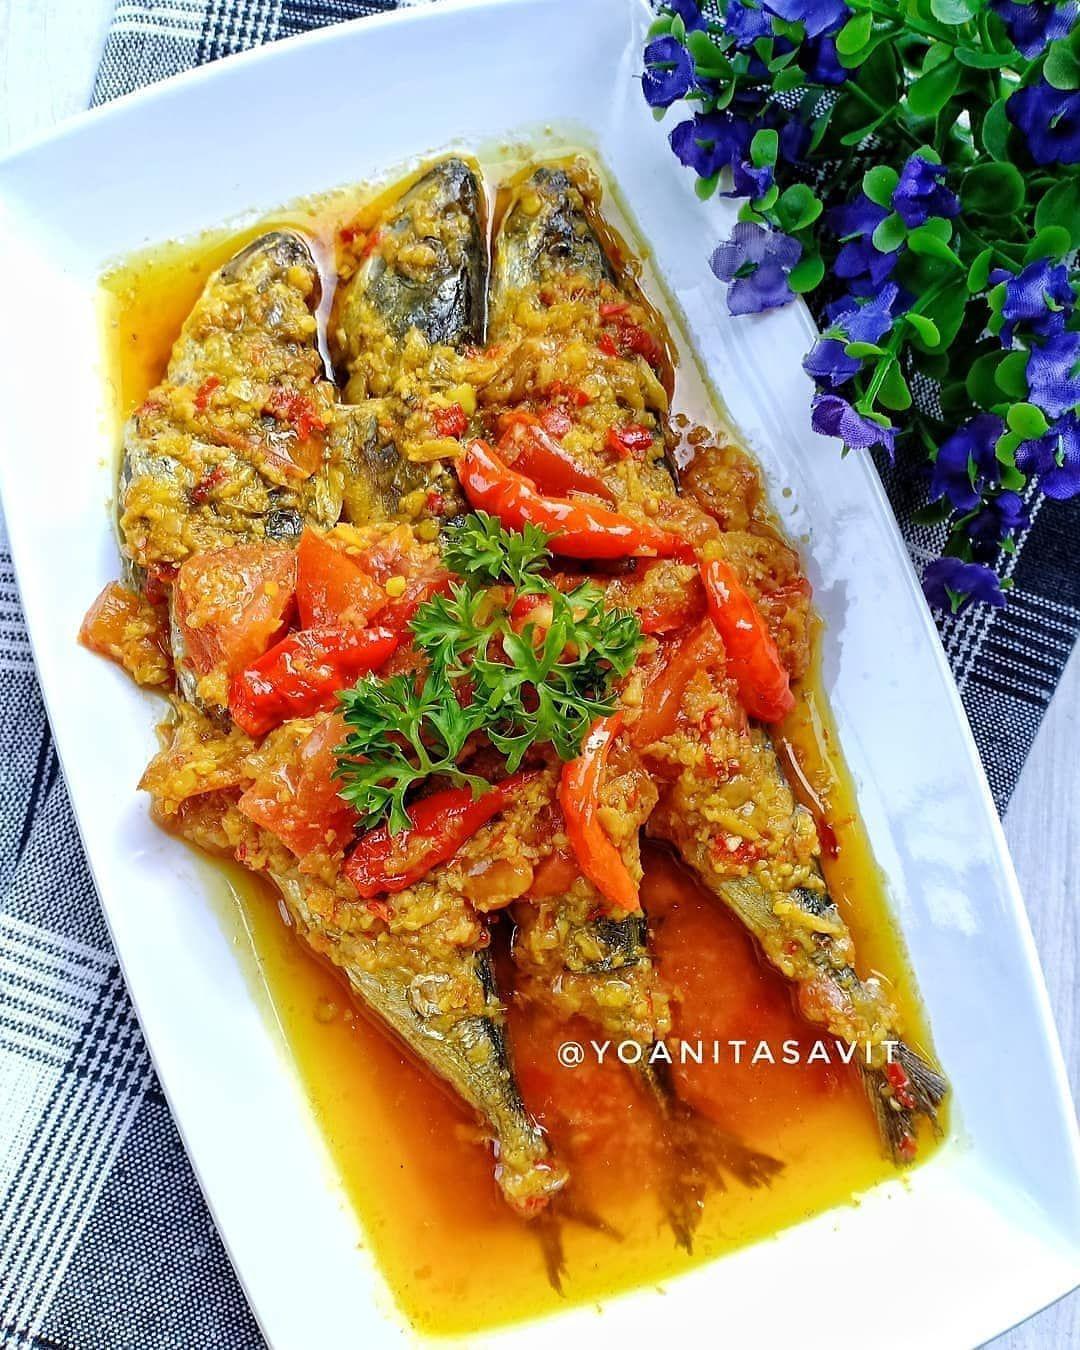 Gambar Mungkin Berisi Makanan Diy Food Recipes Cooking Recipes Food Recipies